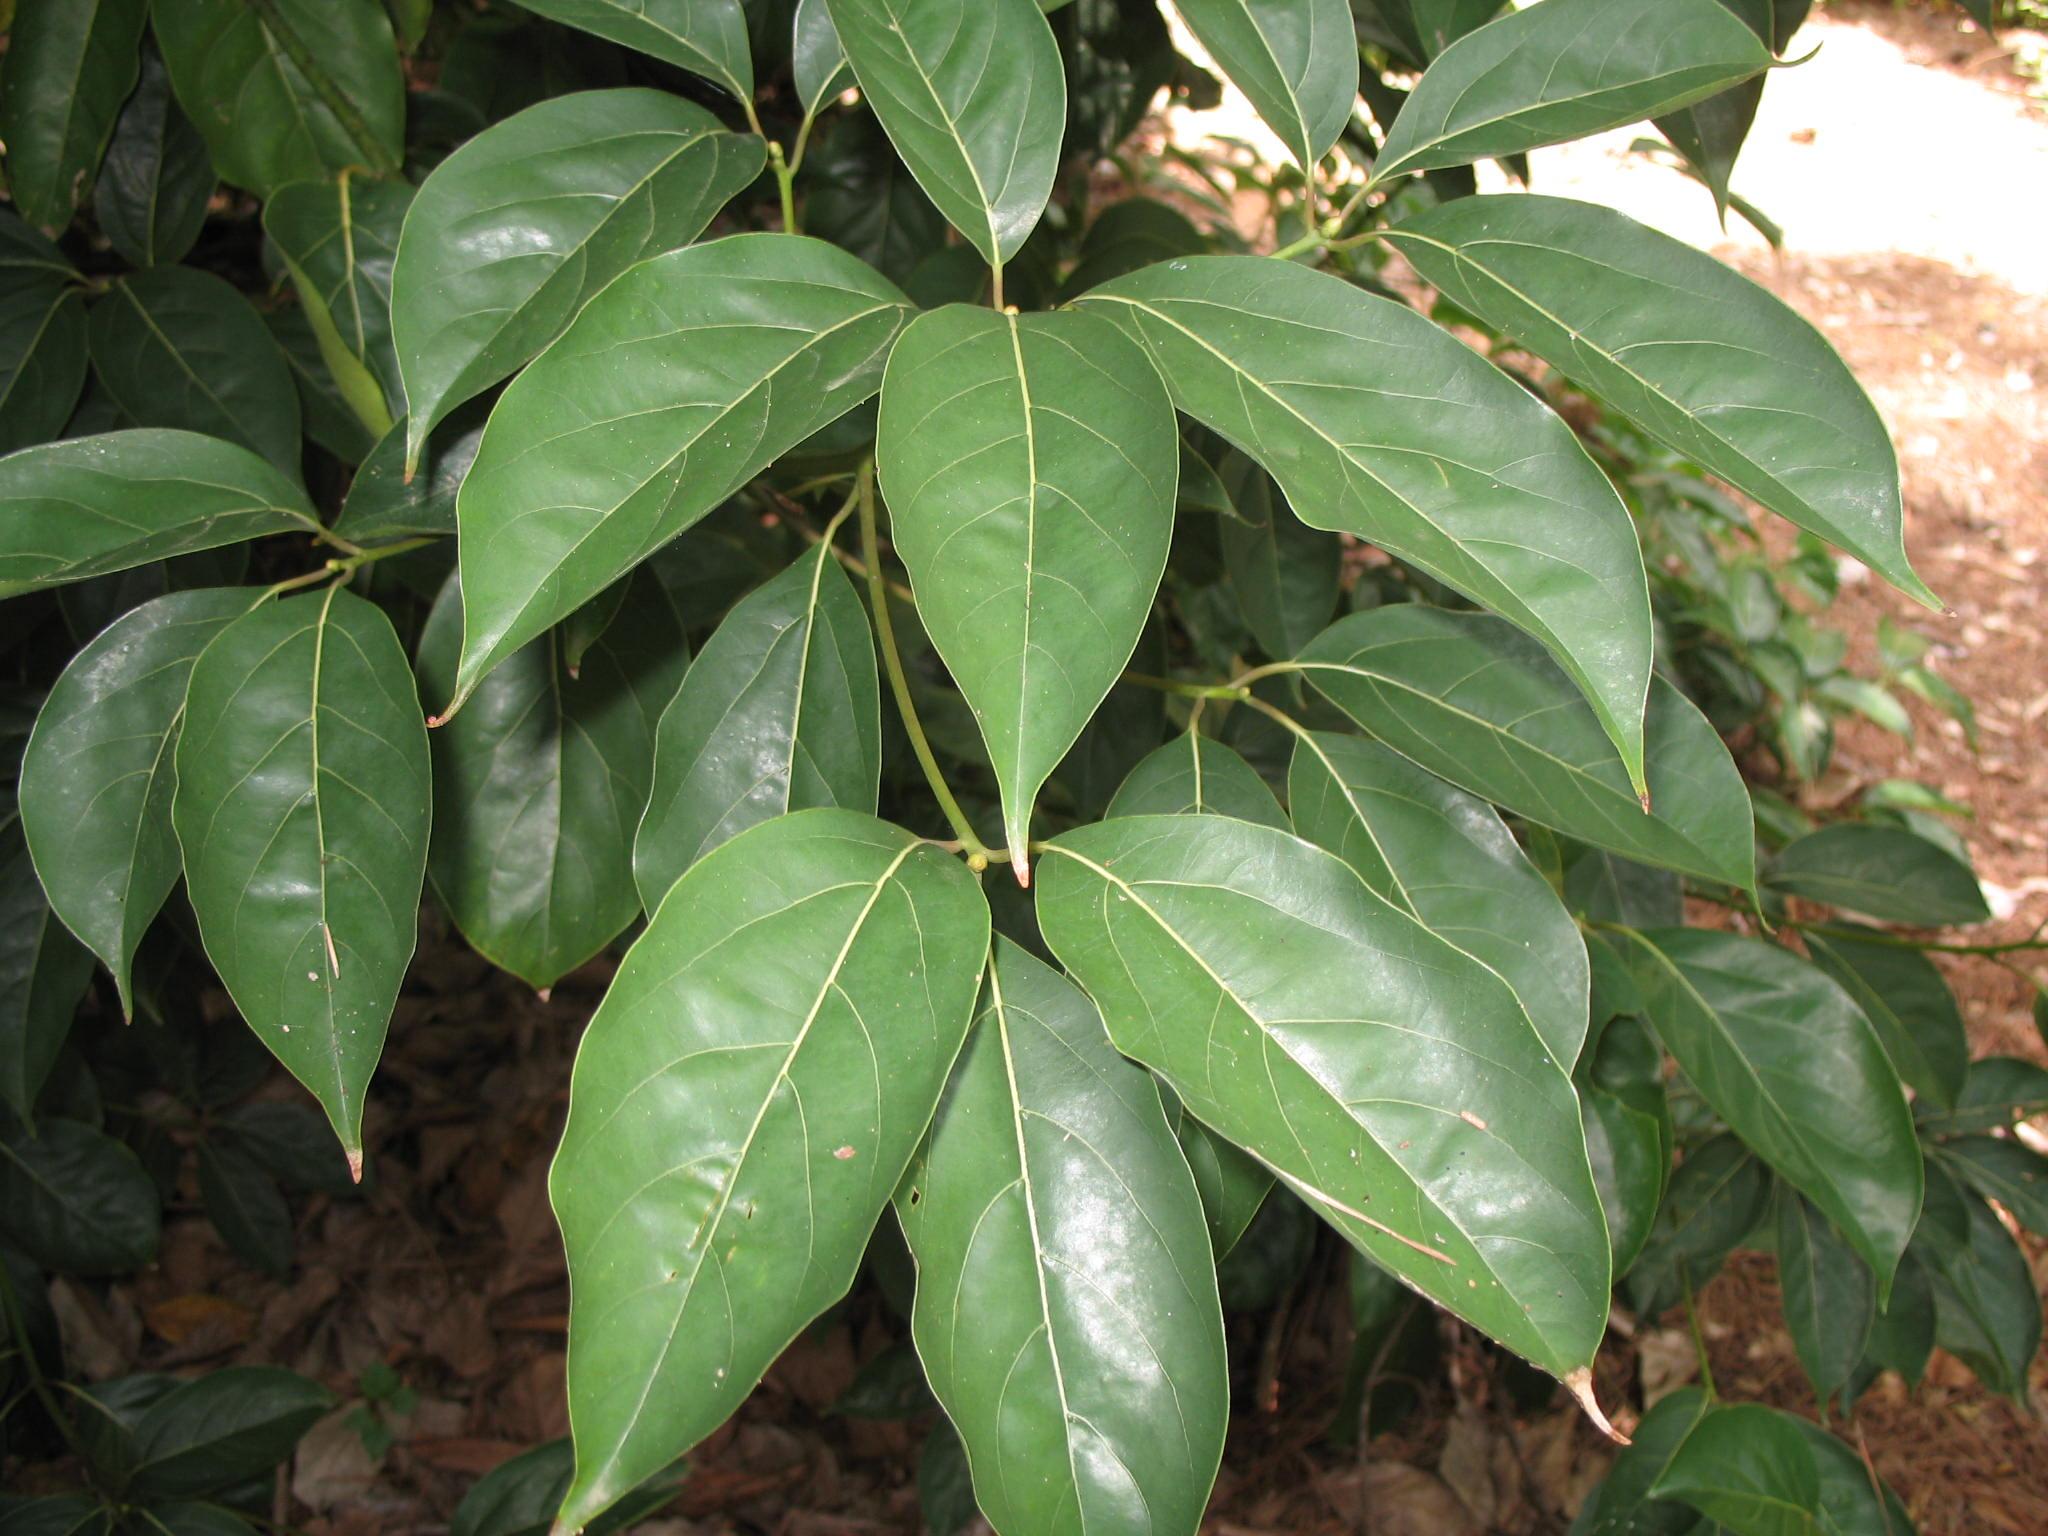 Cinnamomum  micranthum / Cinnamomum  micranthum